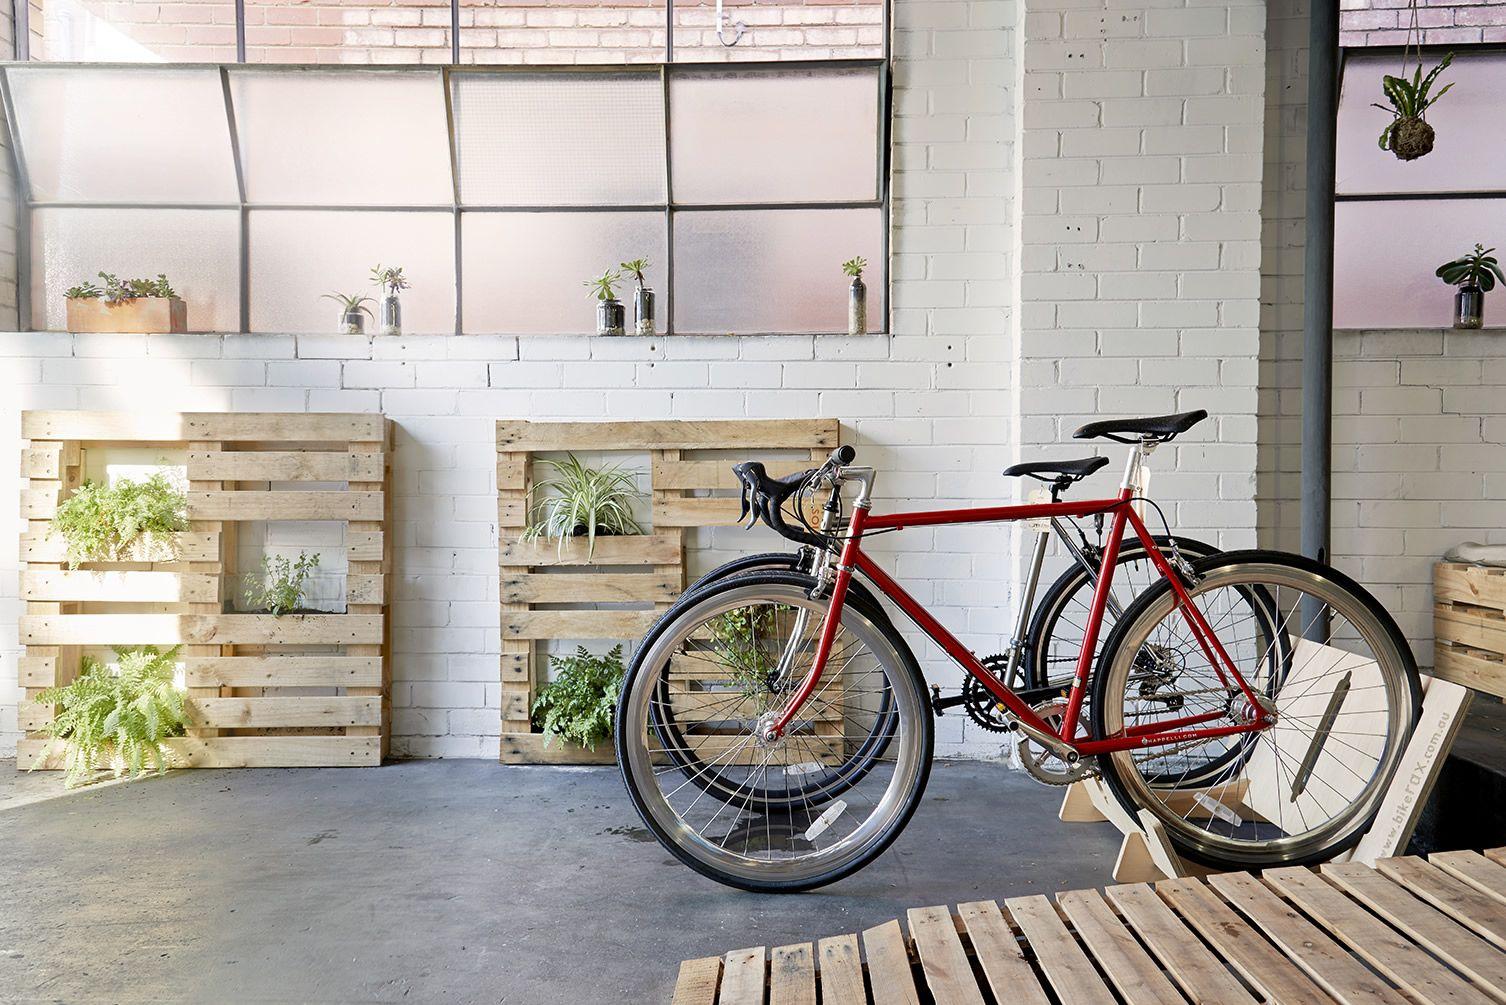 An Englishman in Australia reaps the rewards for award-winning bike ...